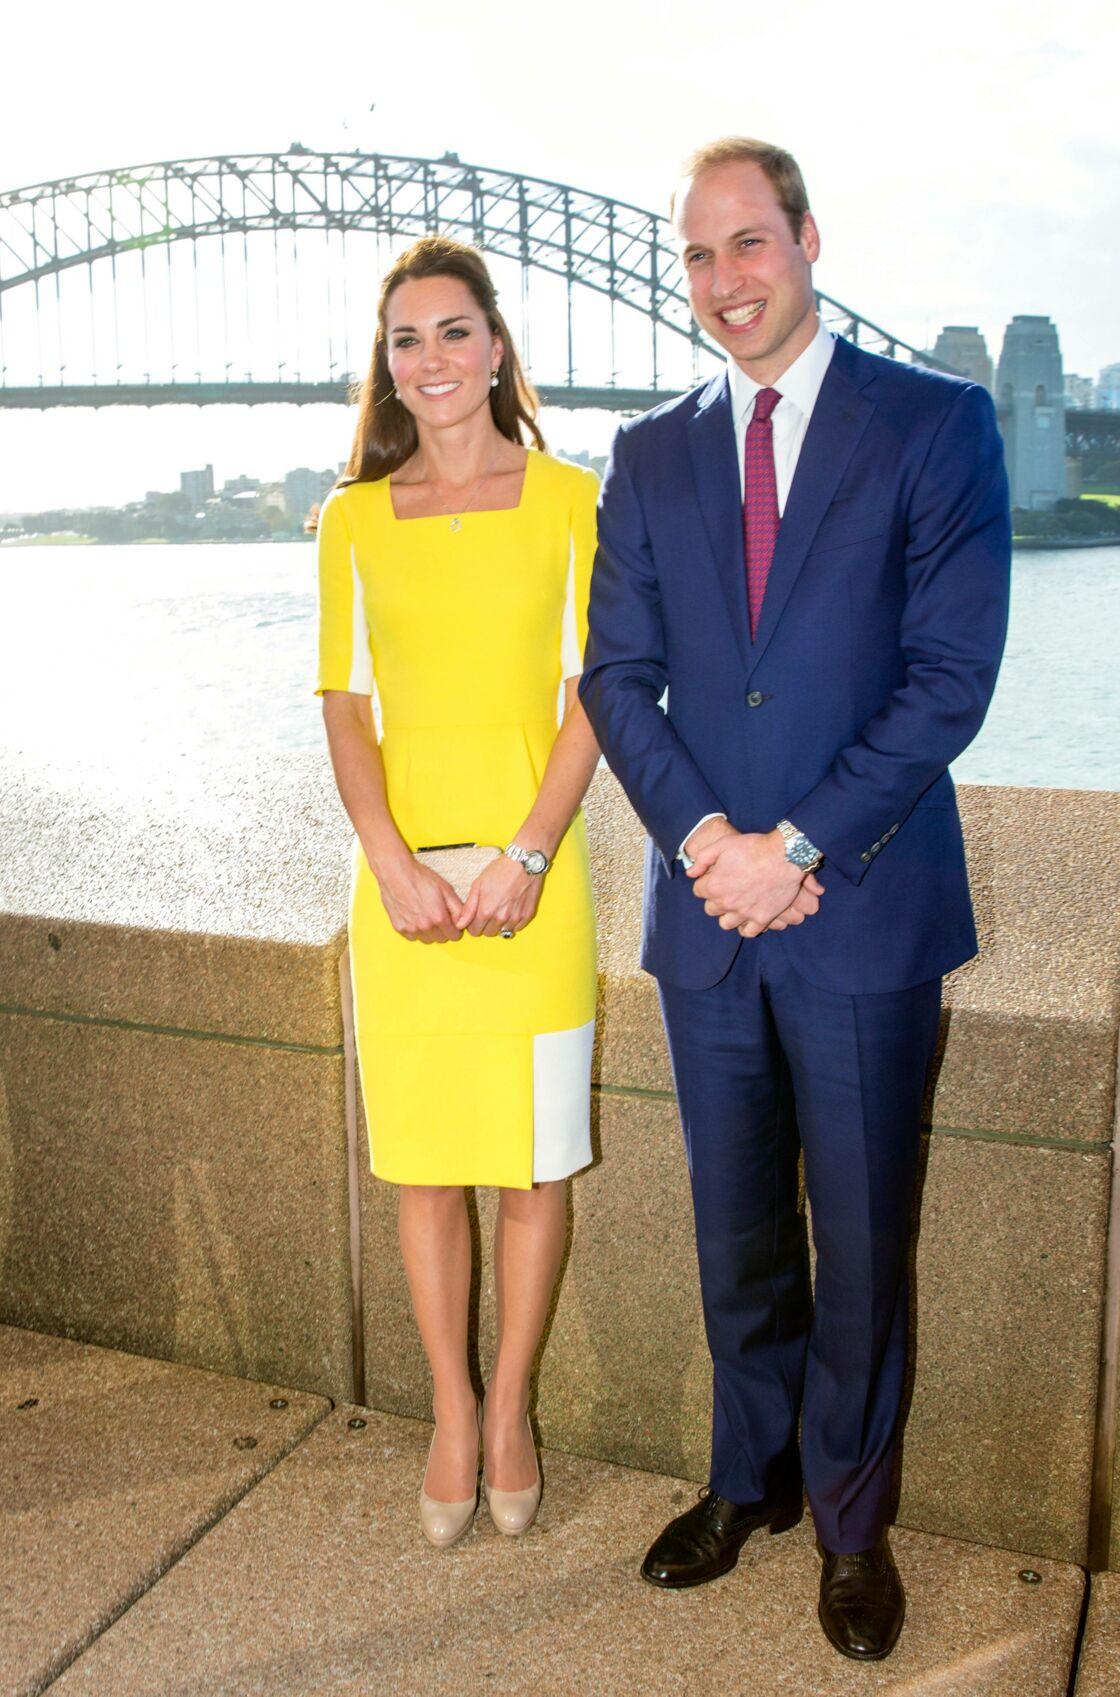 Kate Middleton,sculpturale dans une robe jaune tendance en rupture de stock (photo) - Bénin Web TV